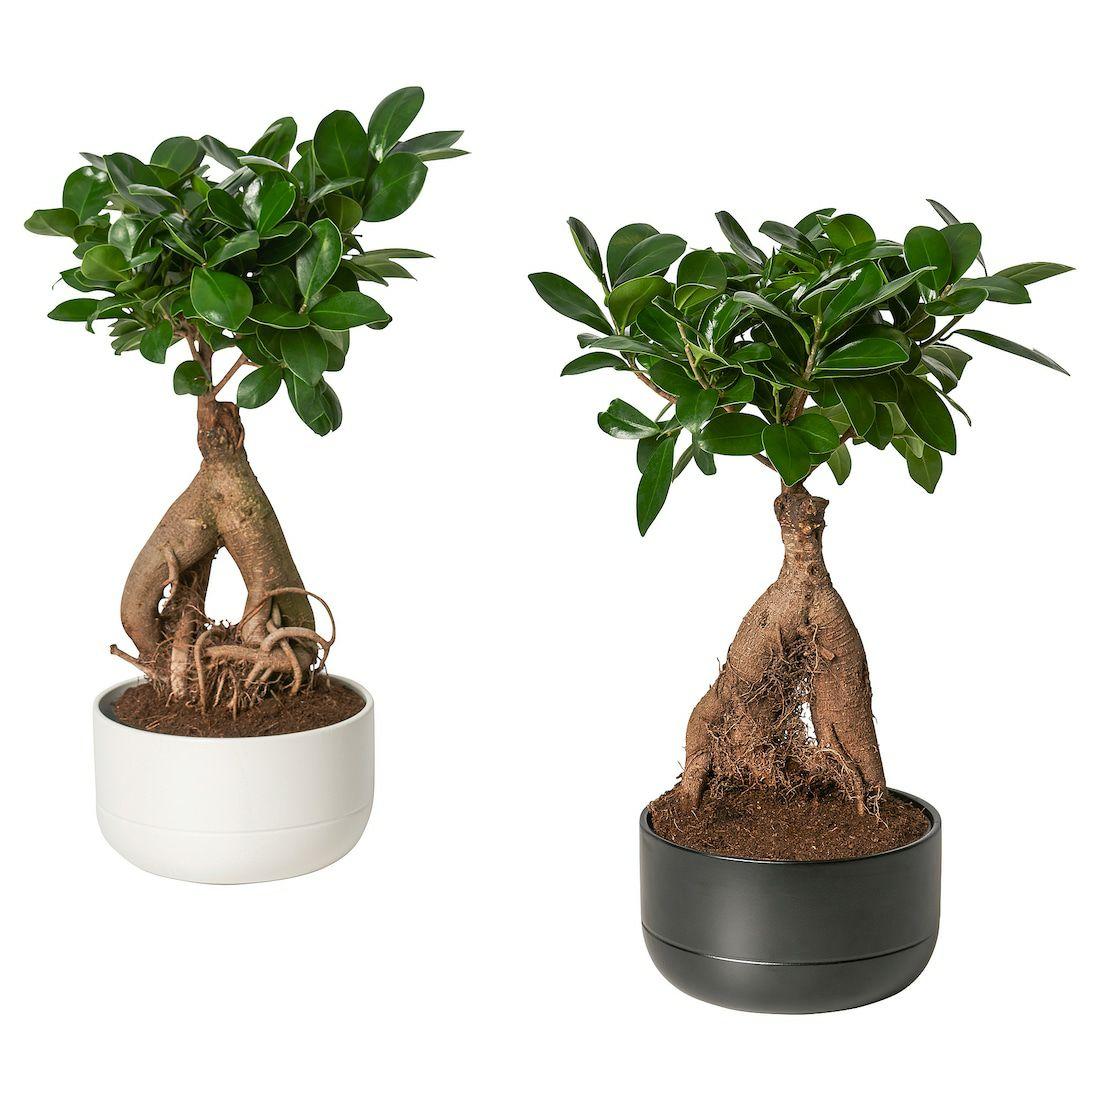 Plante Ficus GINSENG de 14 cm - Caen (14)